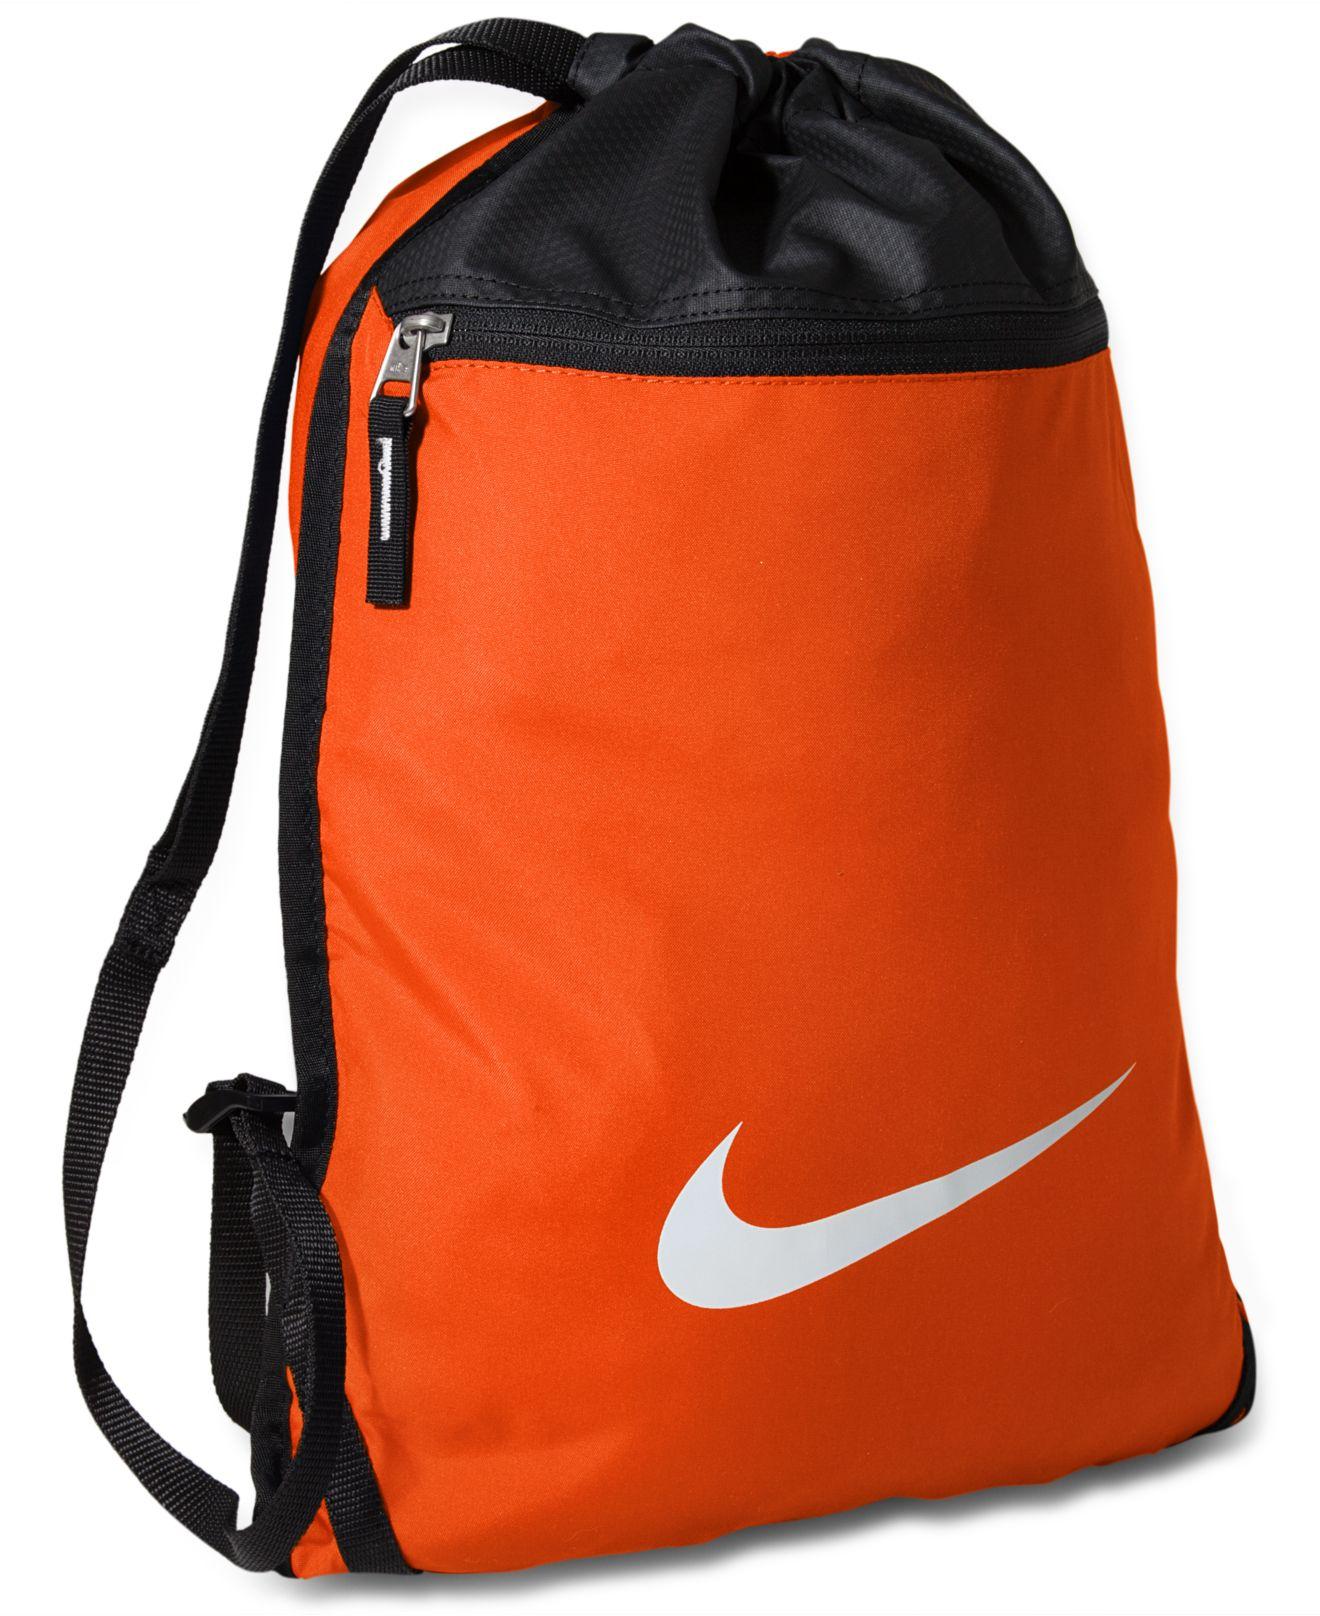 e5f389399d7 100% authentic 2b2af aa9c7 Lyst - Nike Team Training Gymsack Bag in Blue  for Men  online shop ...